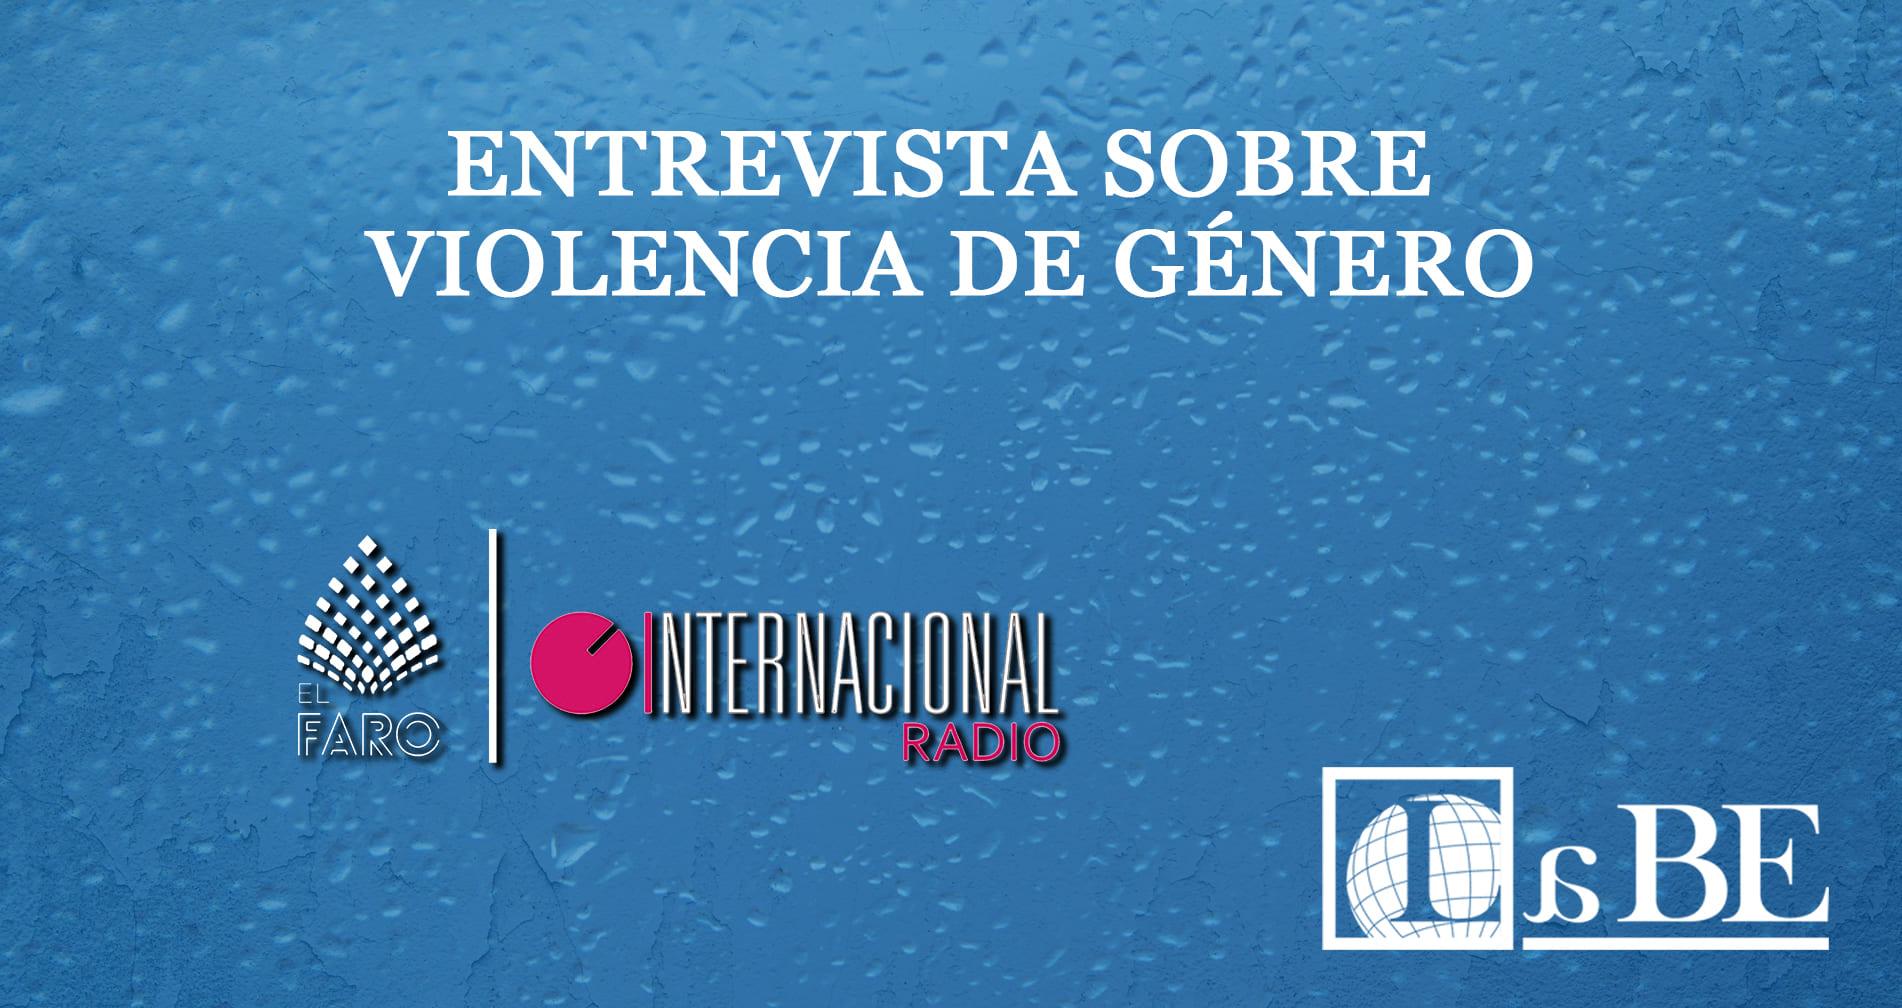 Entrevista sobre violencia de género